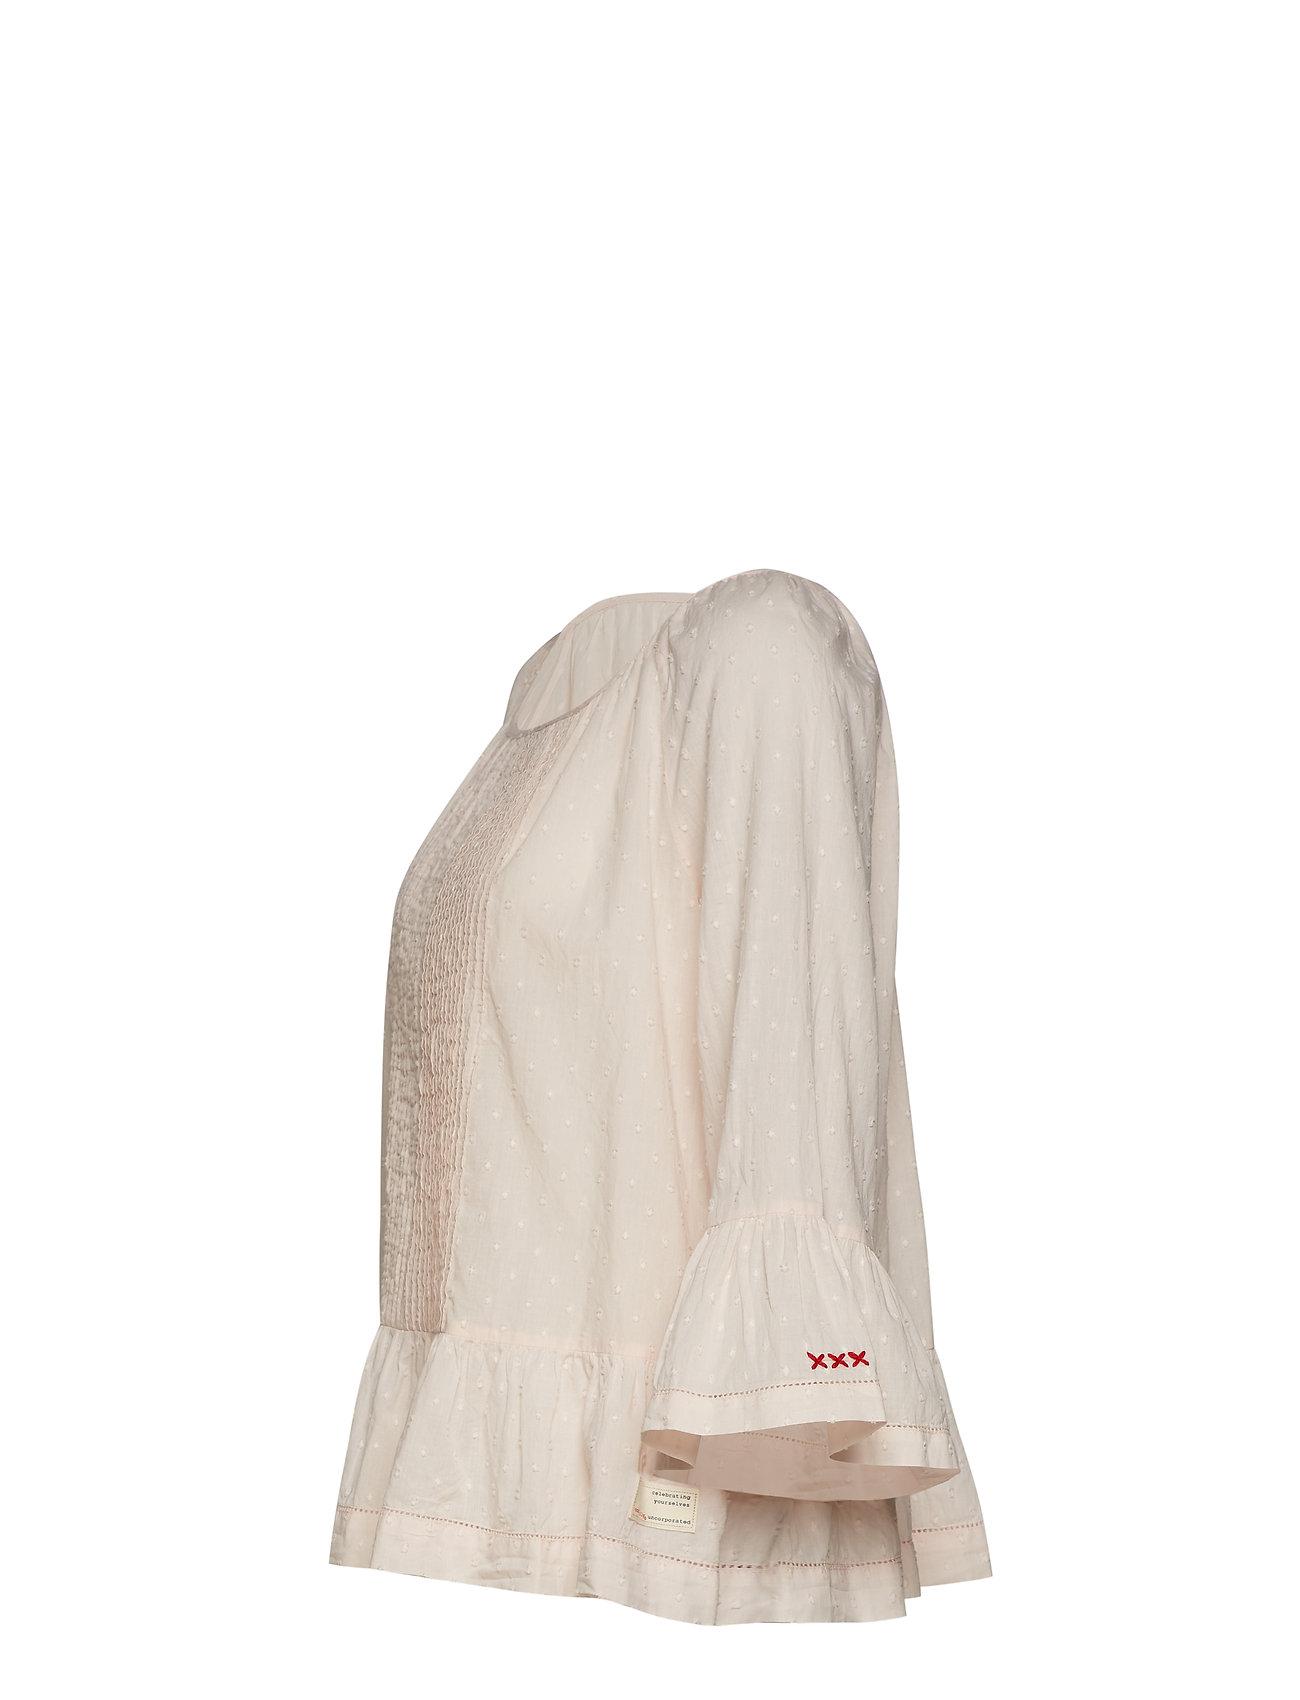 ODD MOLLY    wavelenghts blouse  - Blusen & Hemden    SOFT ROSE